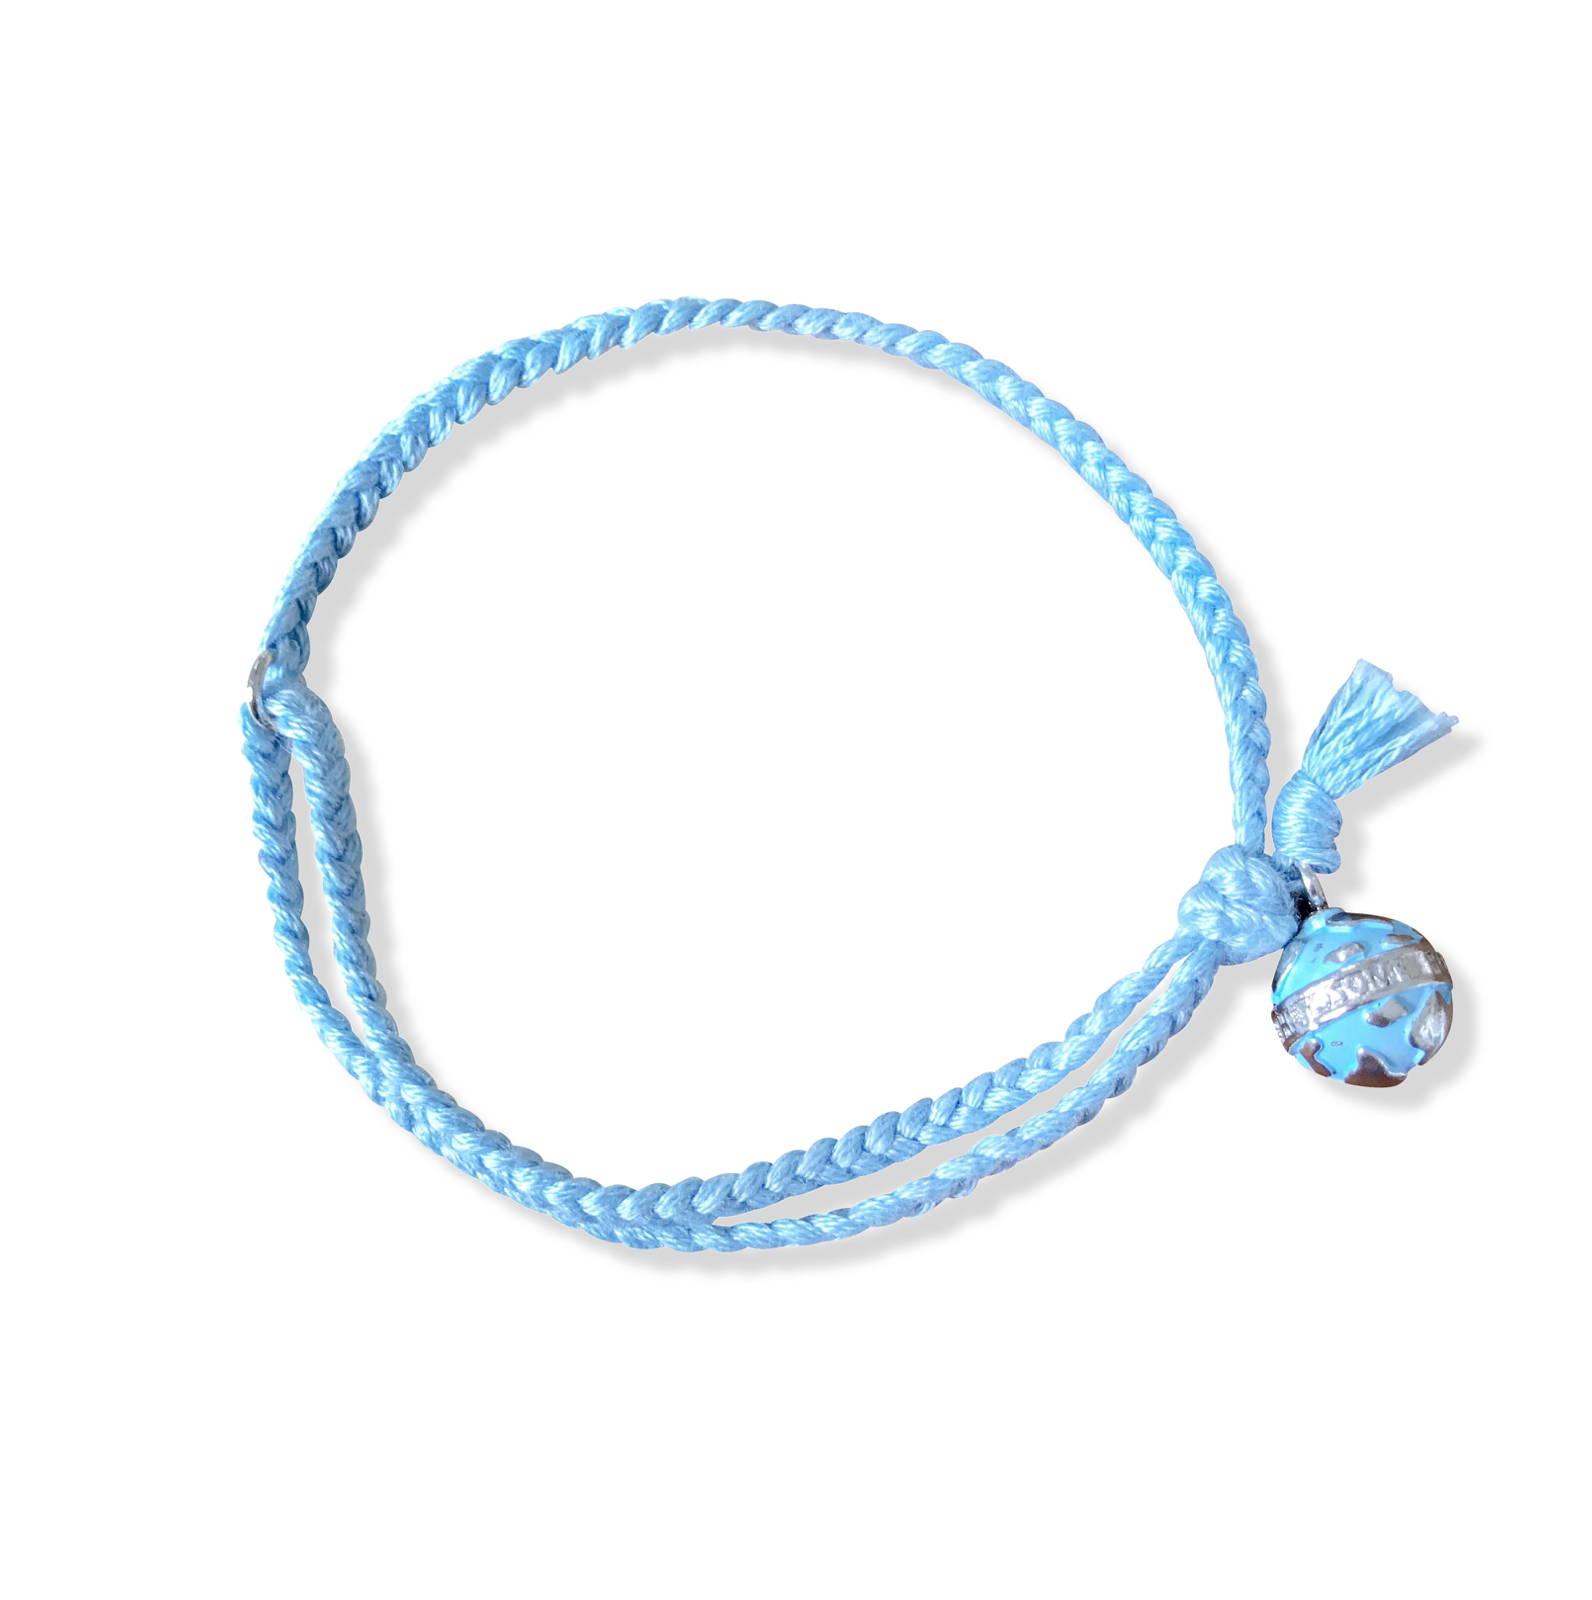 bracelet support water, bracelet benefit water, water charity bracelet, water nonprofit bracelet,